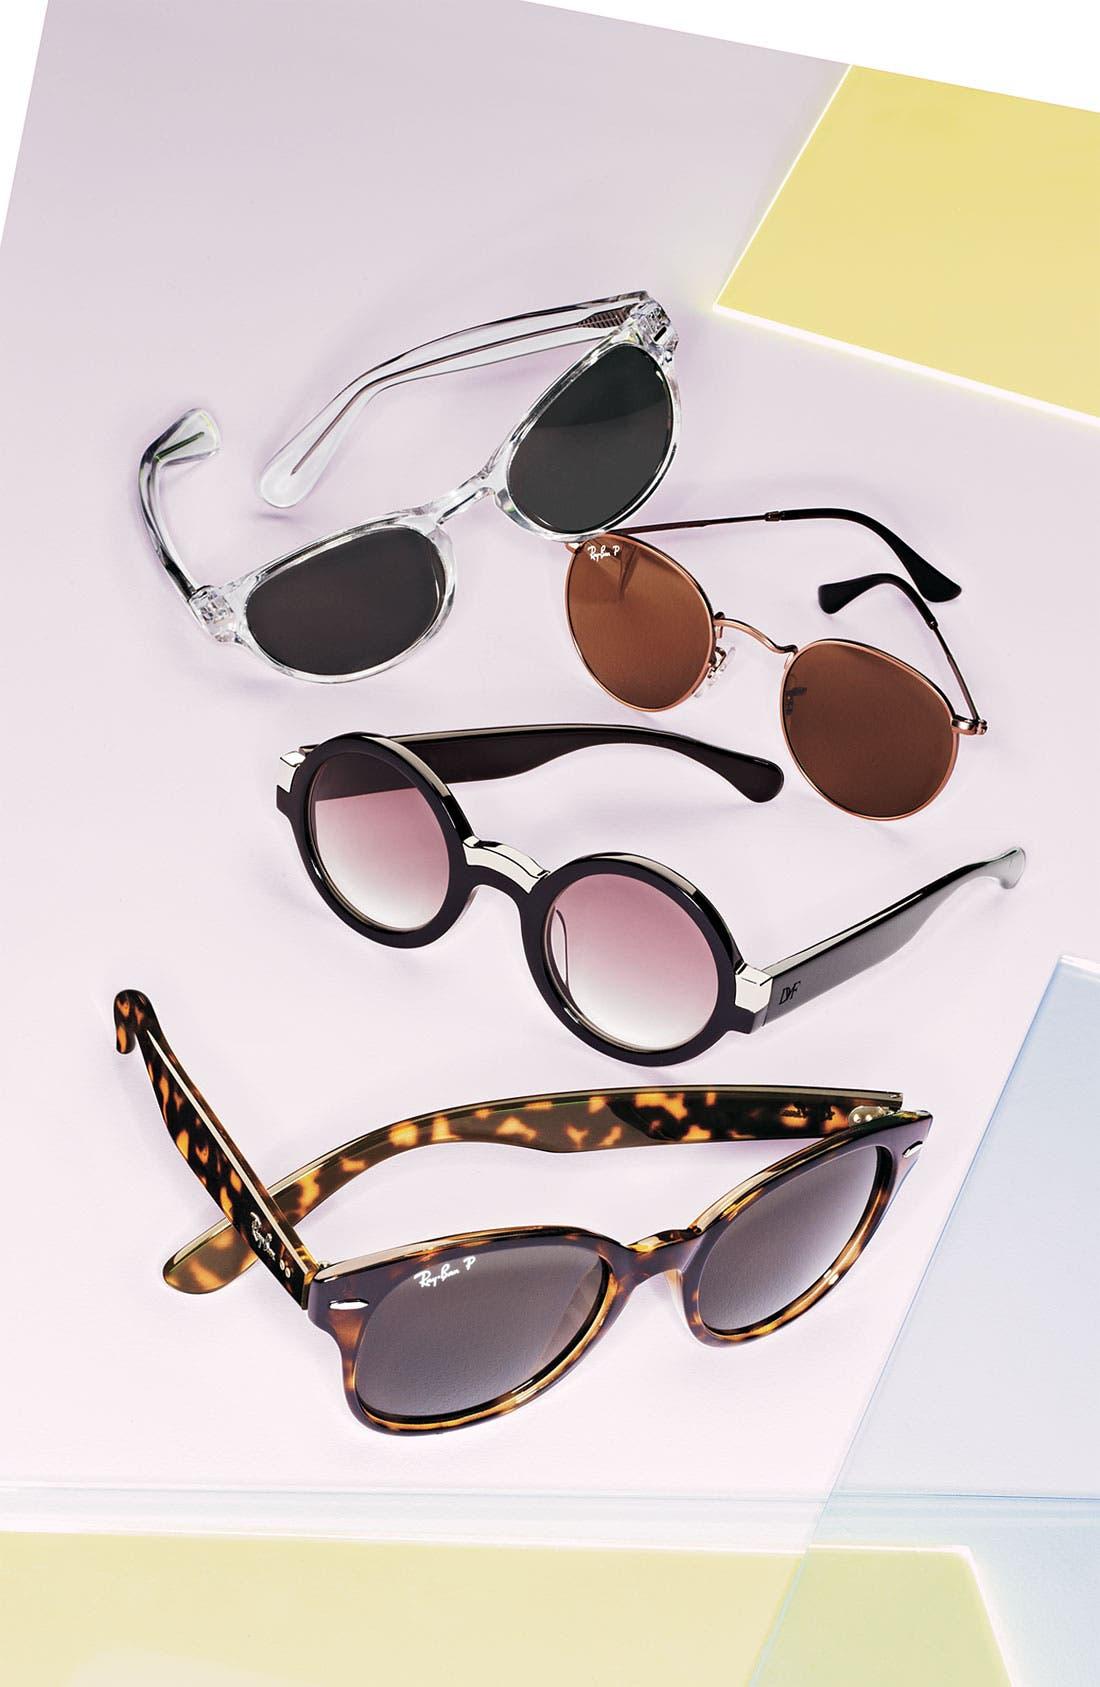 50mm Retro Inspired Round Metal Sunglasses,                             Alternate thumbnail 2, color,                             043